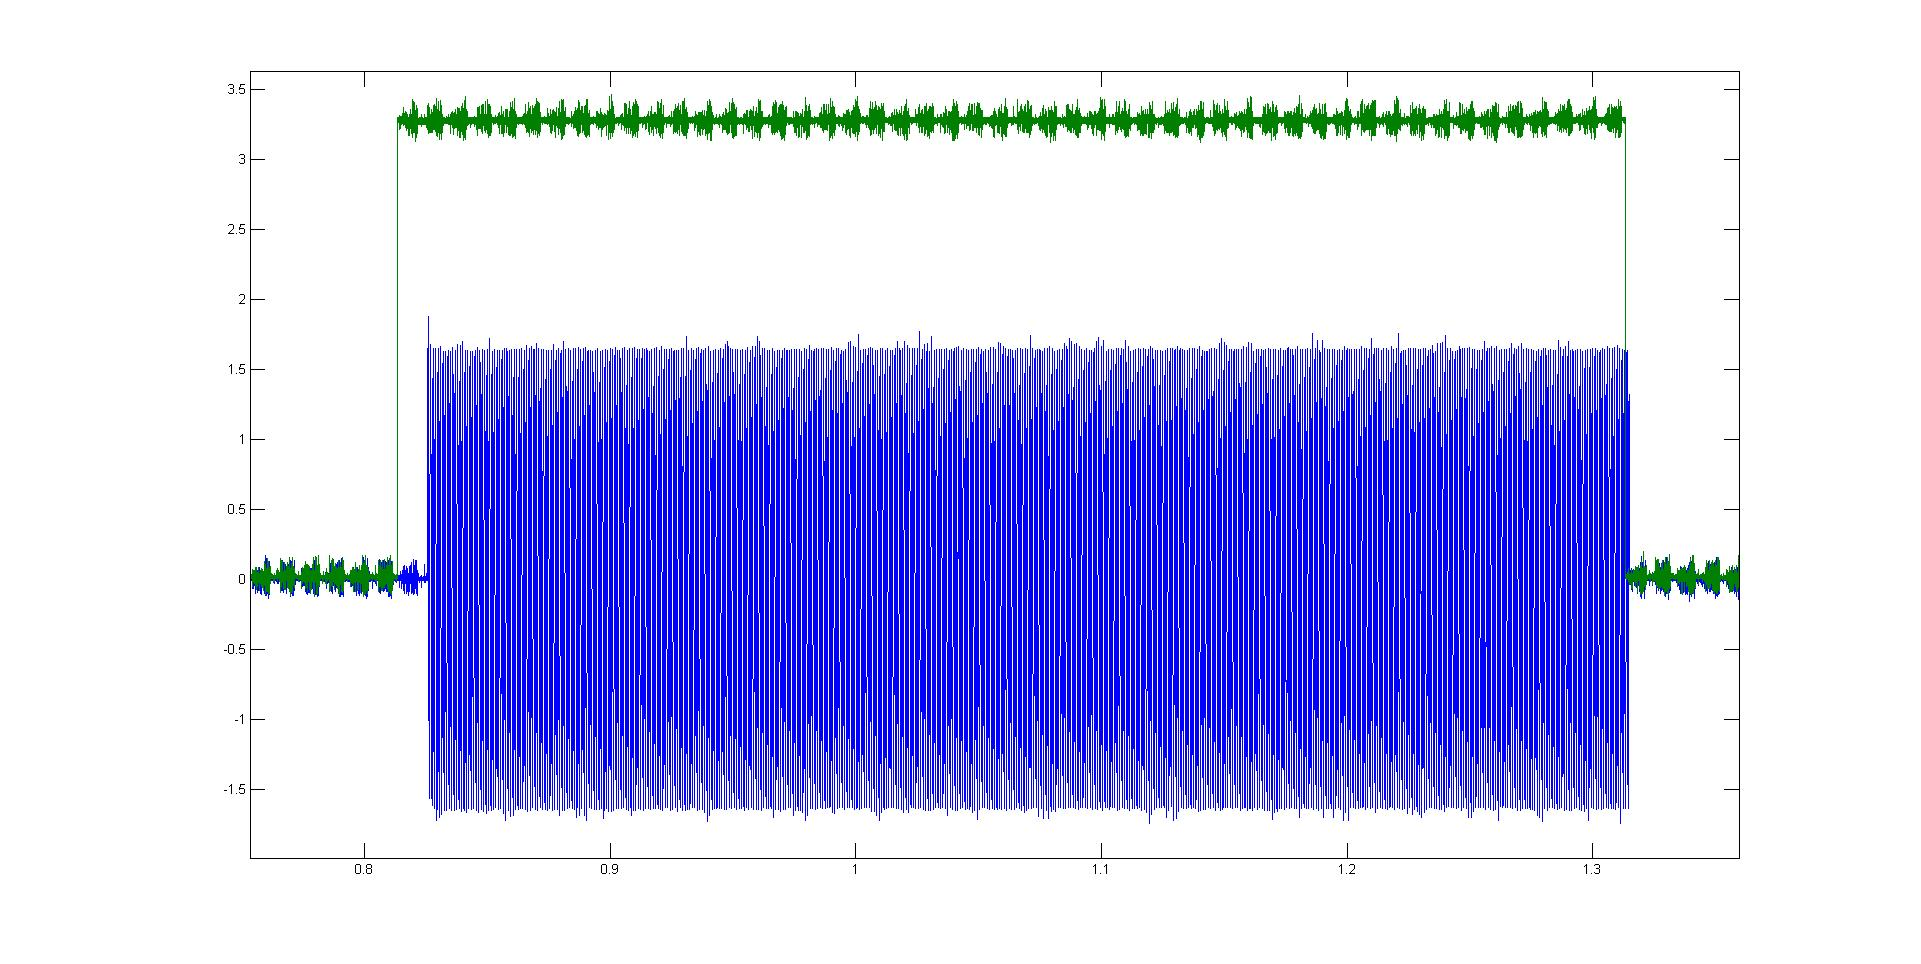 Latency · Issue #98 · spatialaudio/python-sounddevice · GitHub